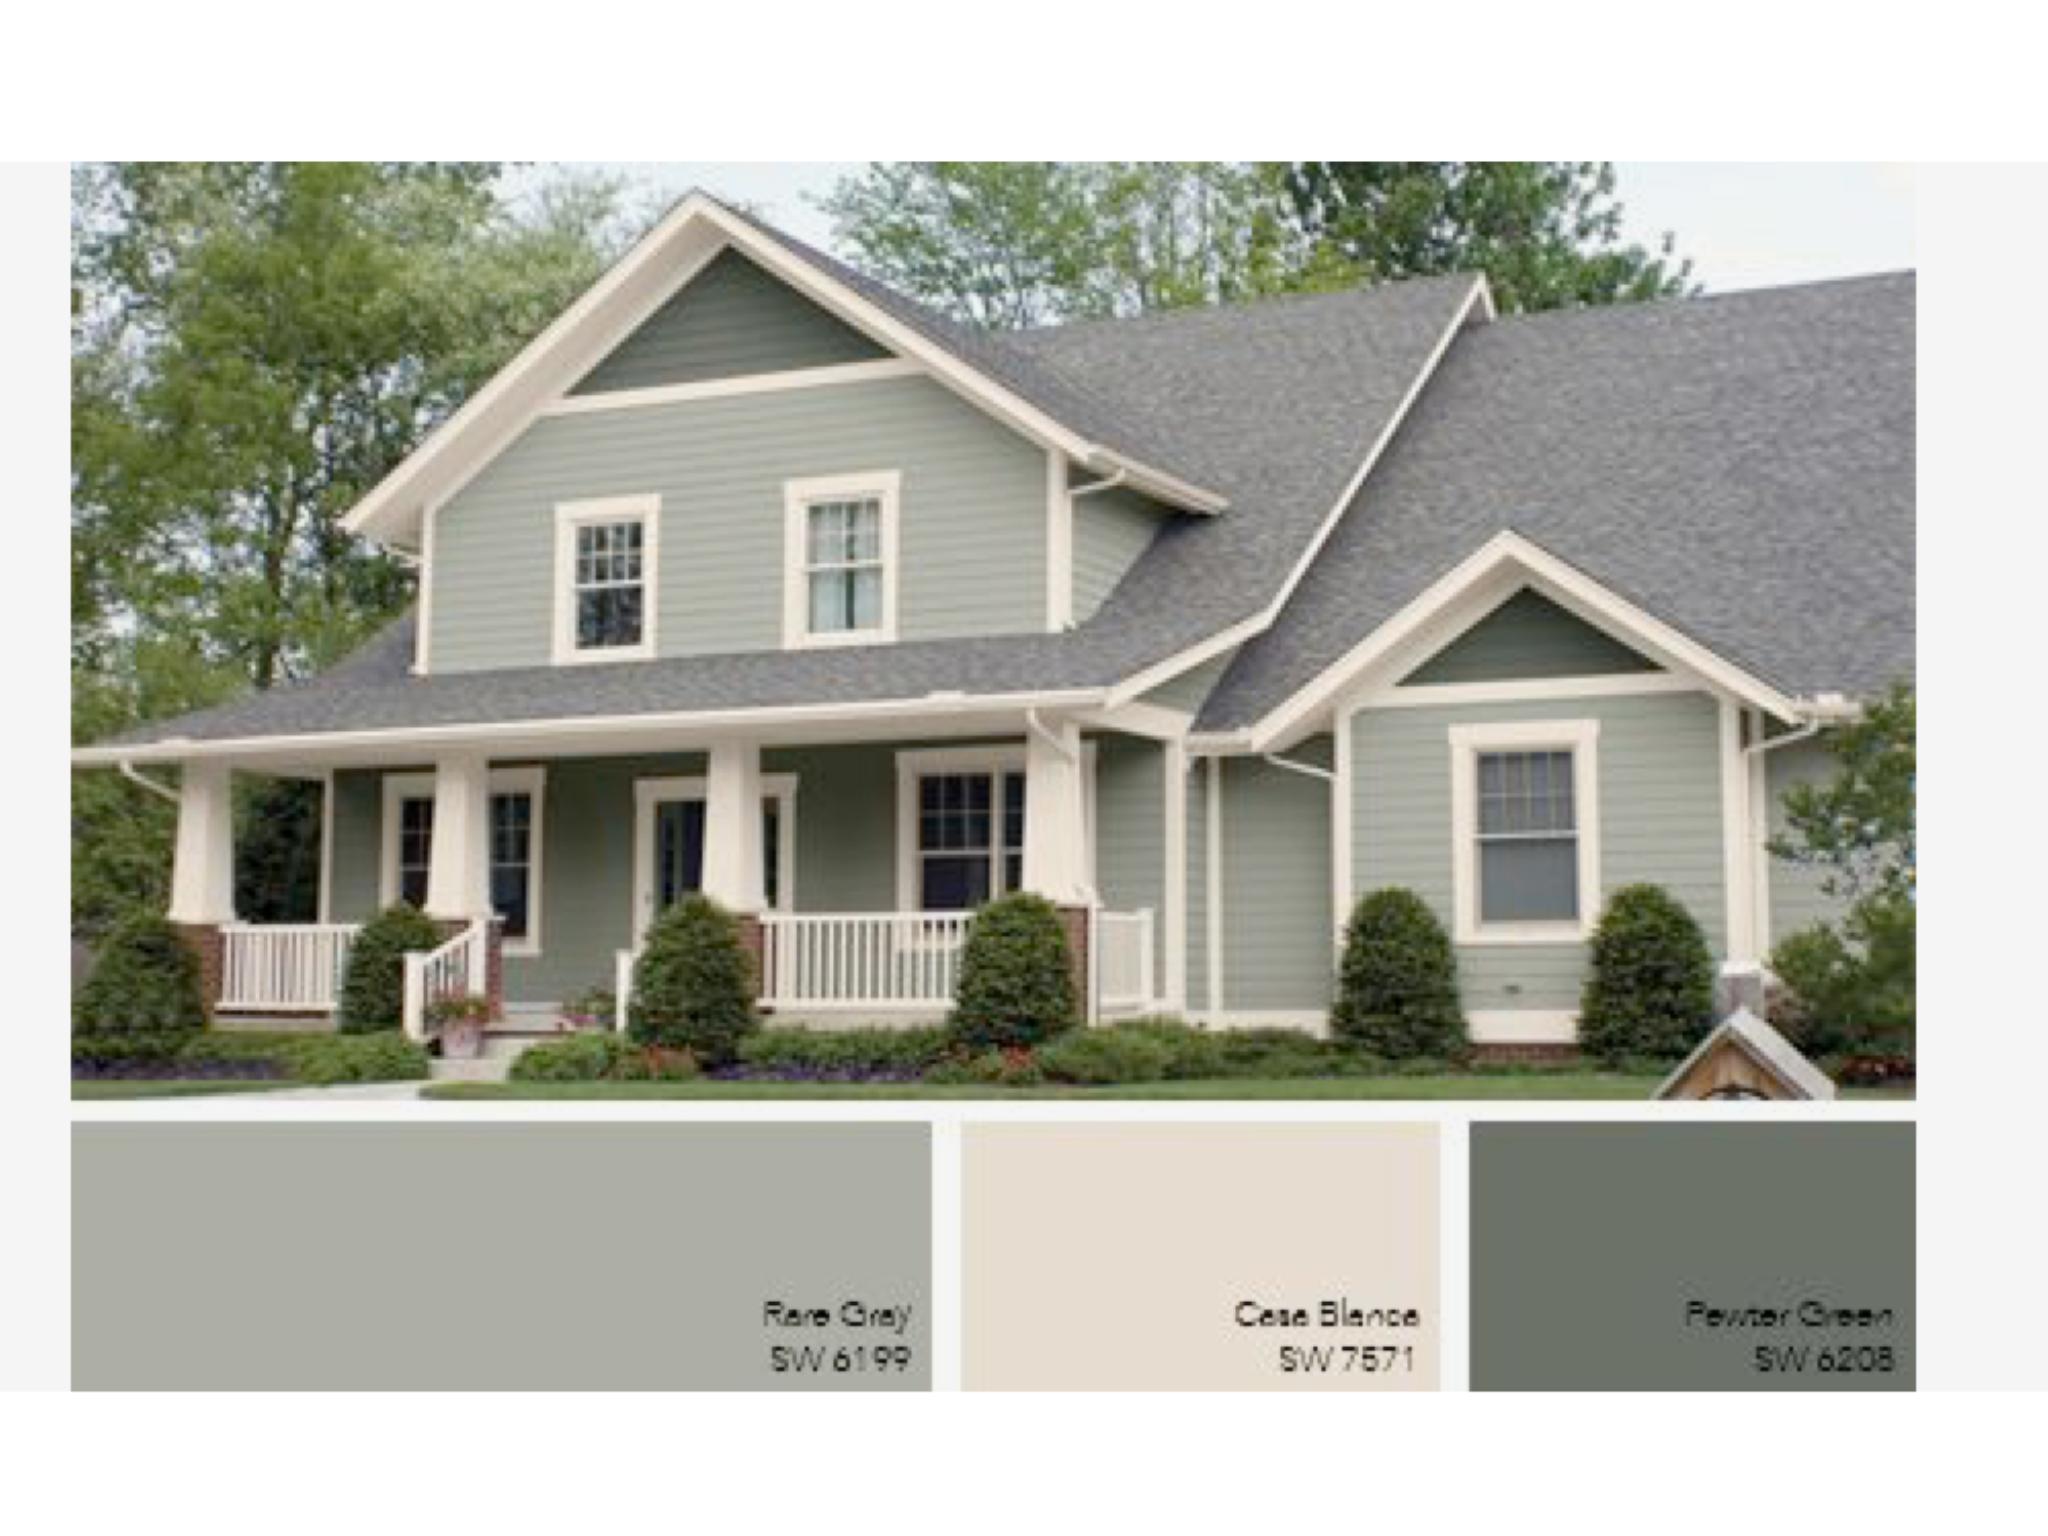 Pin von holly fischer engel auf house ideas exterior - Green exterior house color ideas ...